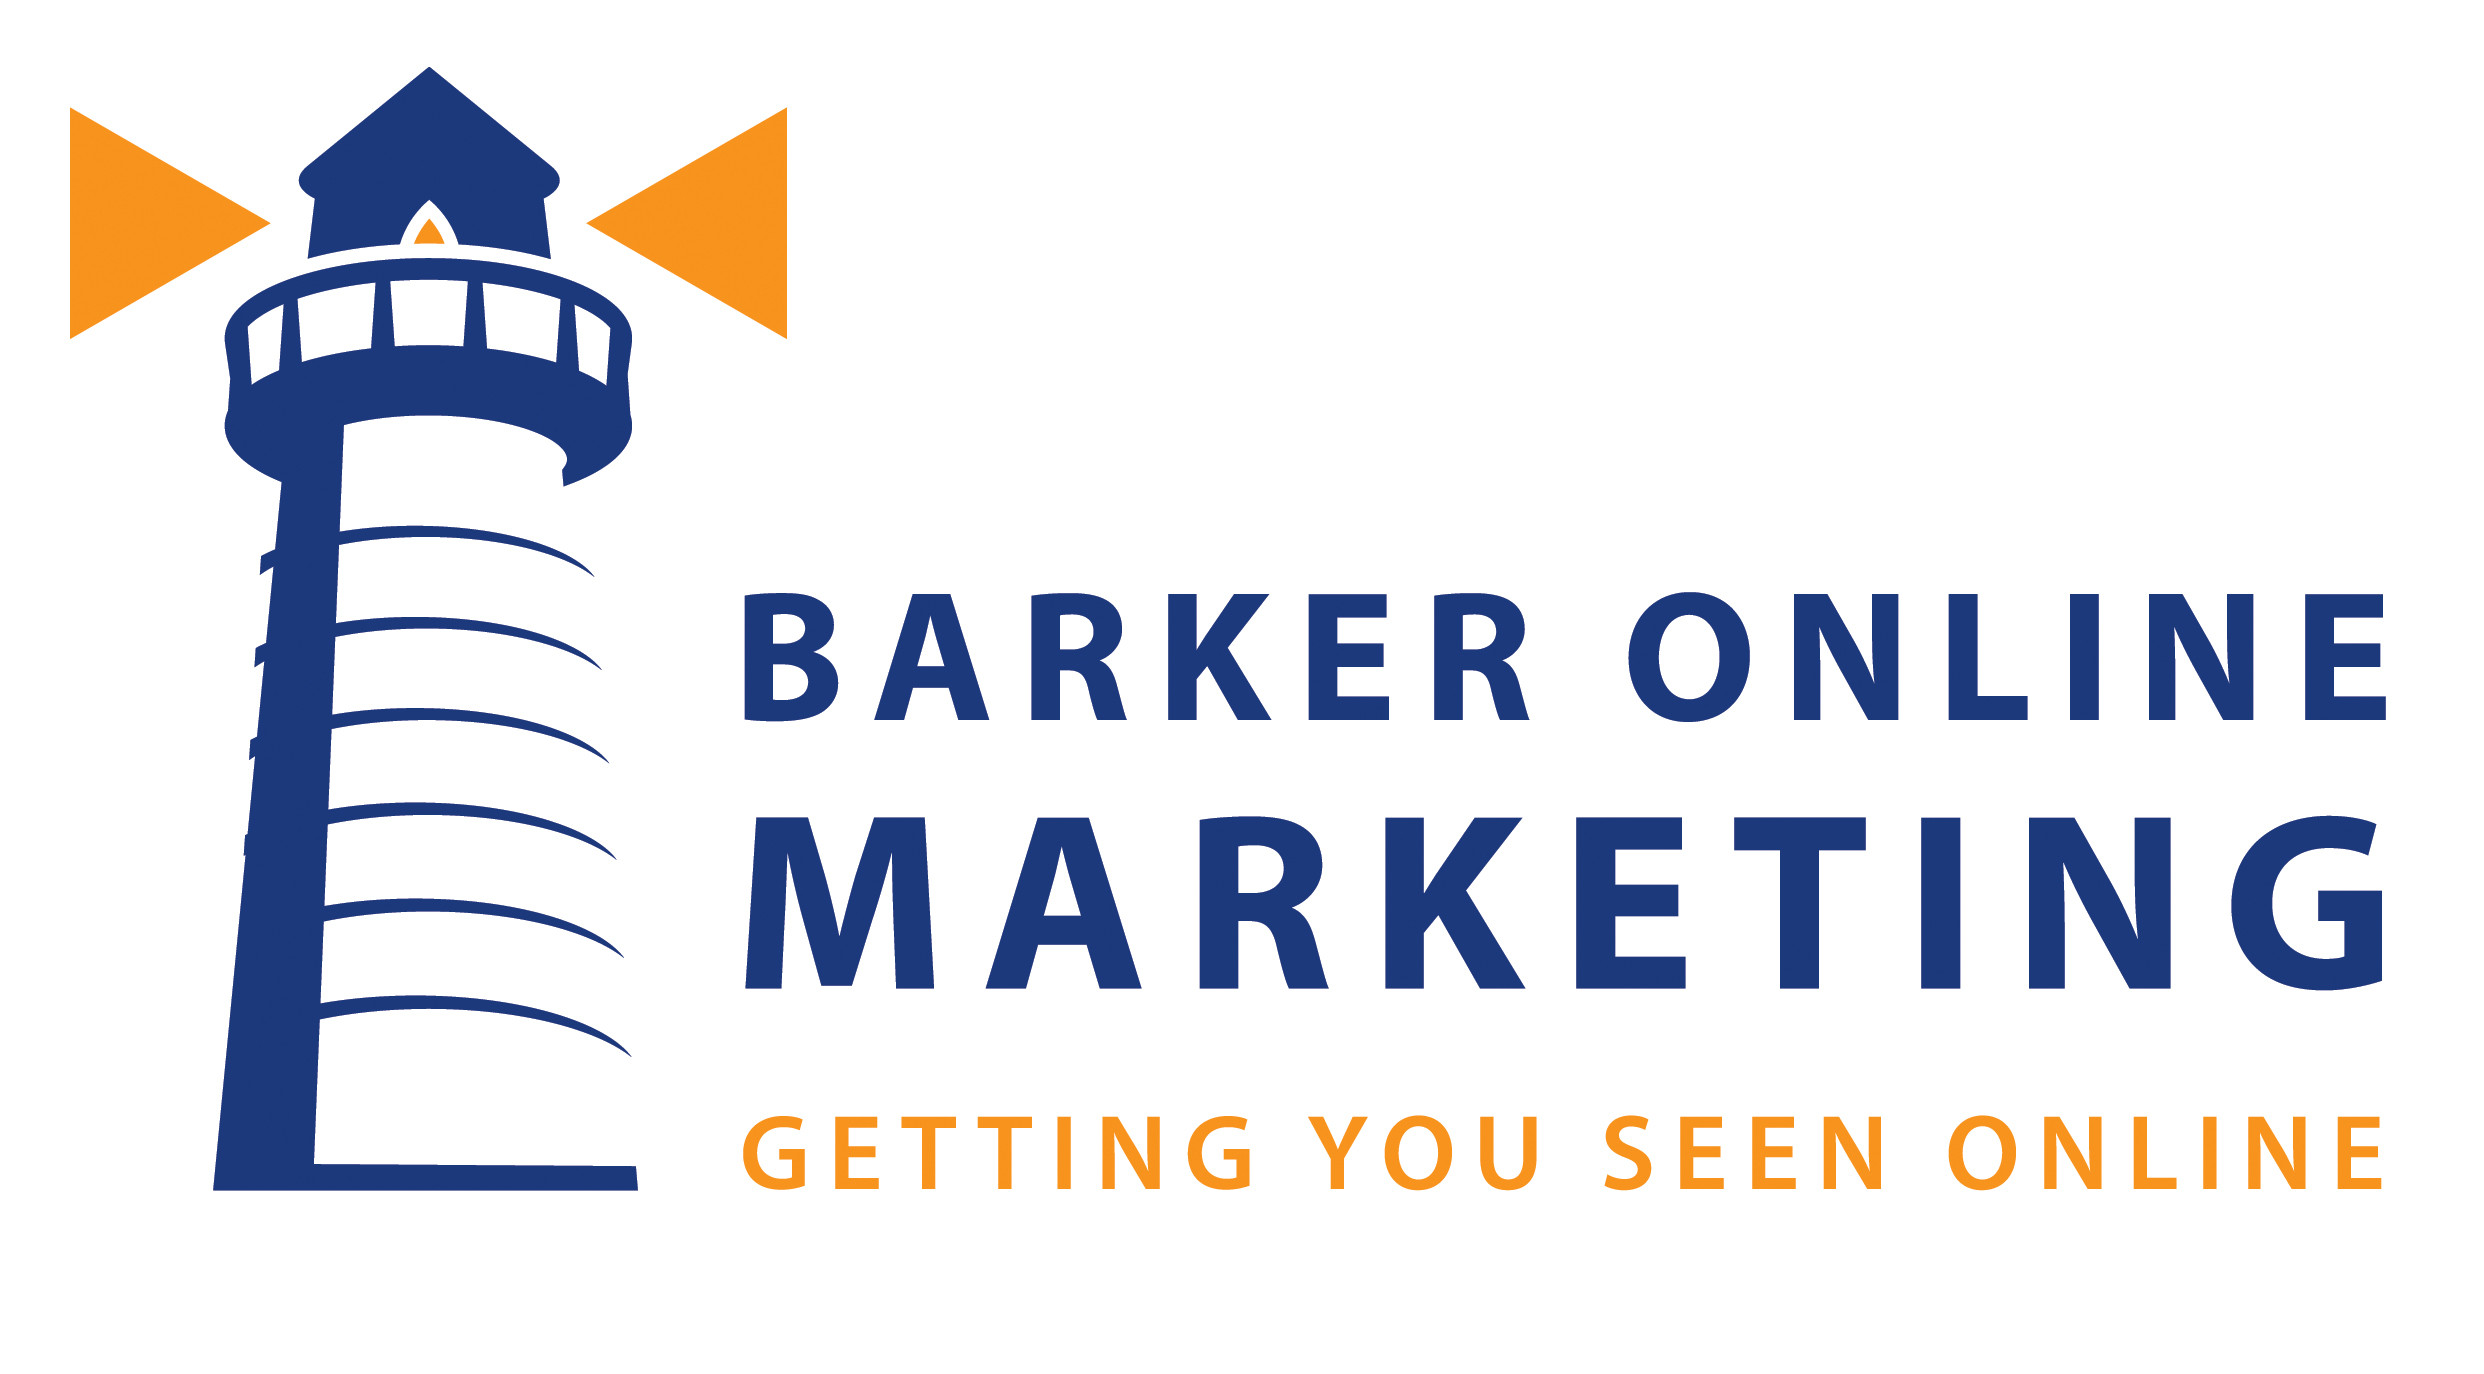 Barker Online Marketing